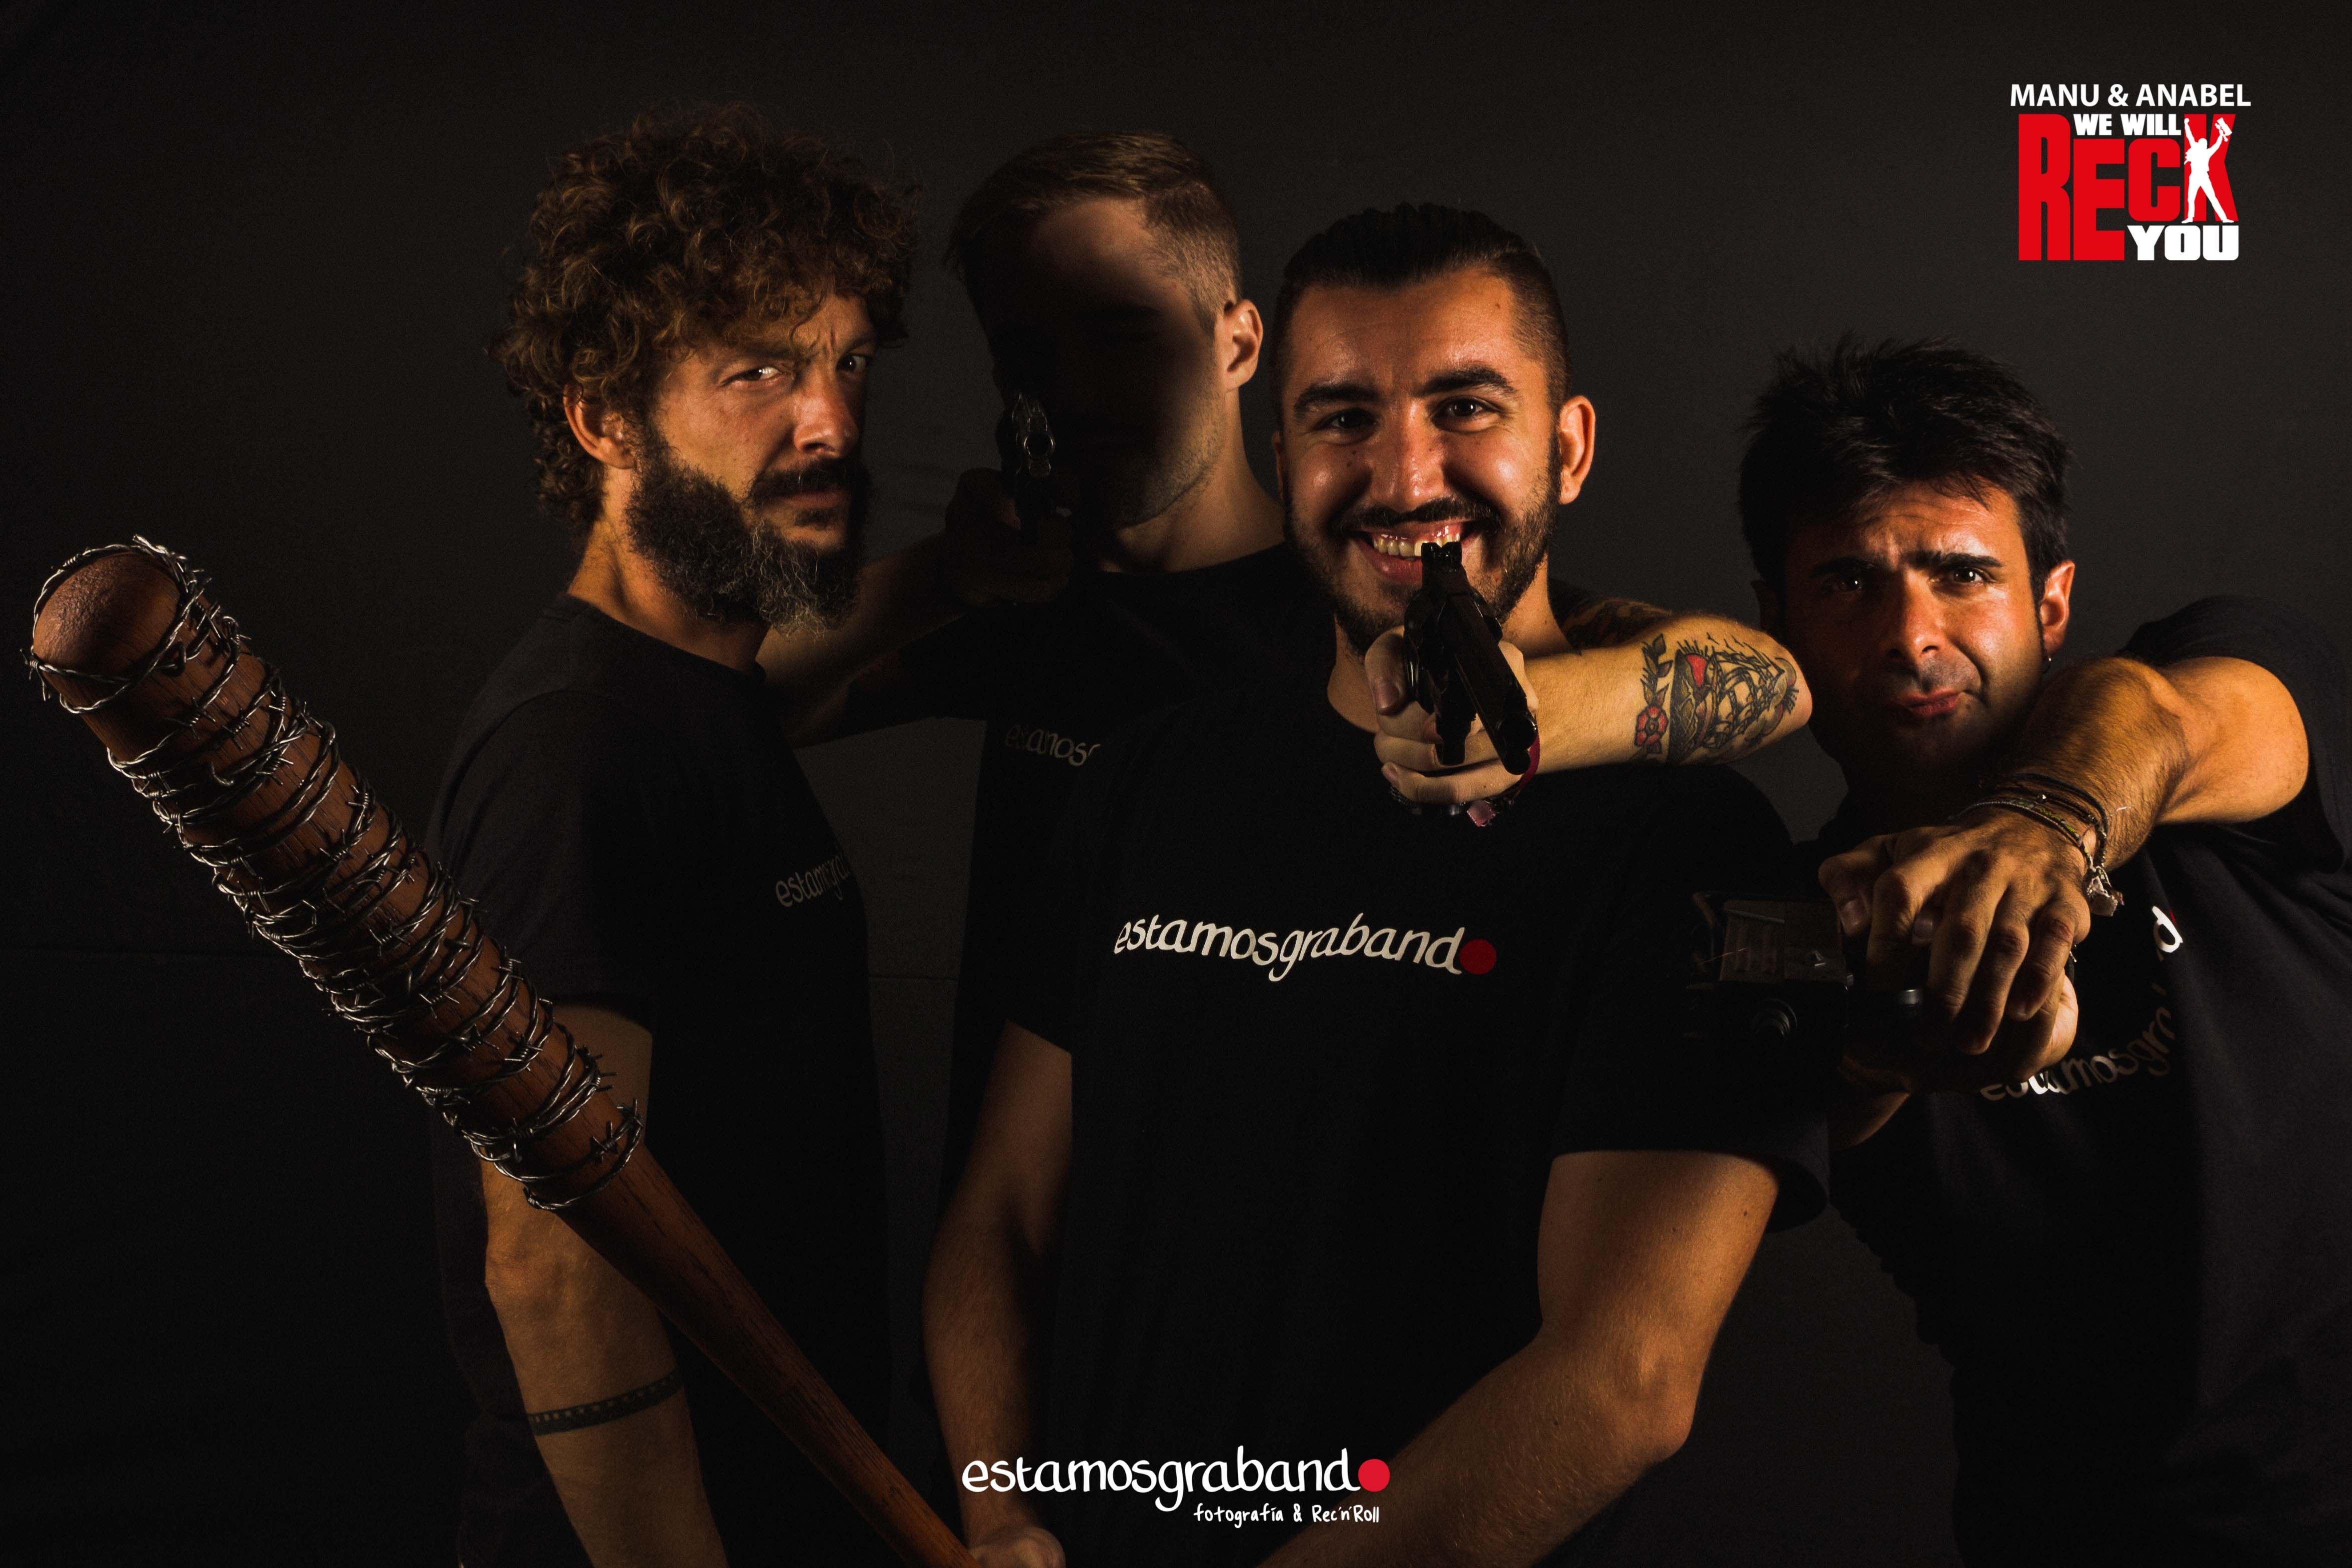 Fotocall-Recandroller_Manu-Anabel-2 Fotocall Recandroller Manu + Anabel _ Jerez de la Frontera - video boda cadiz